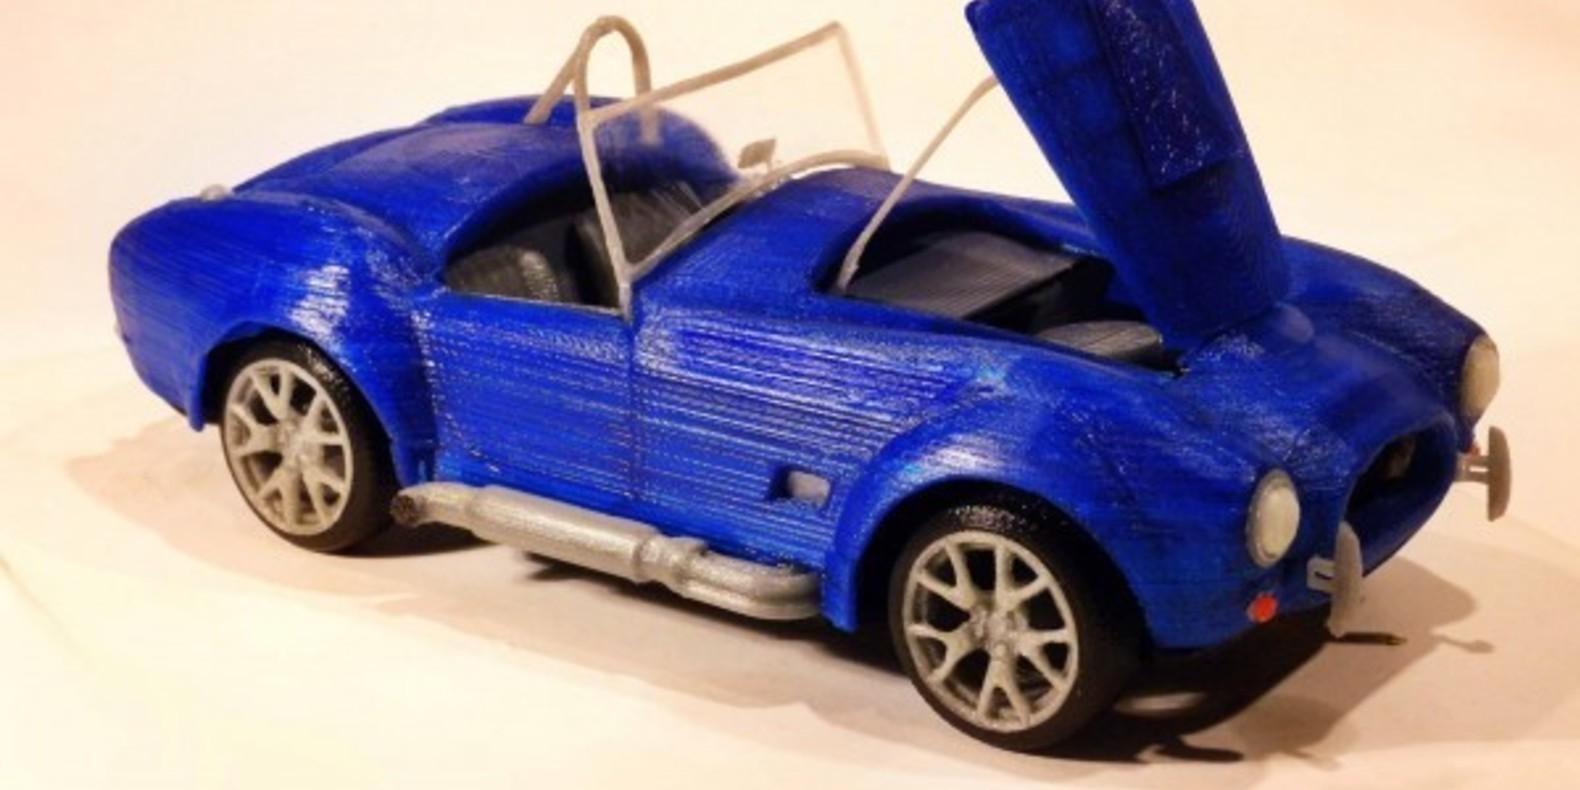 American Sports Car 1 - Mao Casella - Cults Cults modélisme 3D printing Impression 3D Fichier 3D